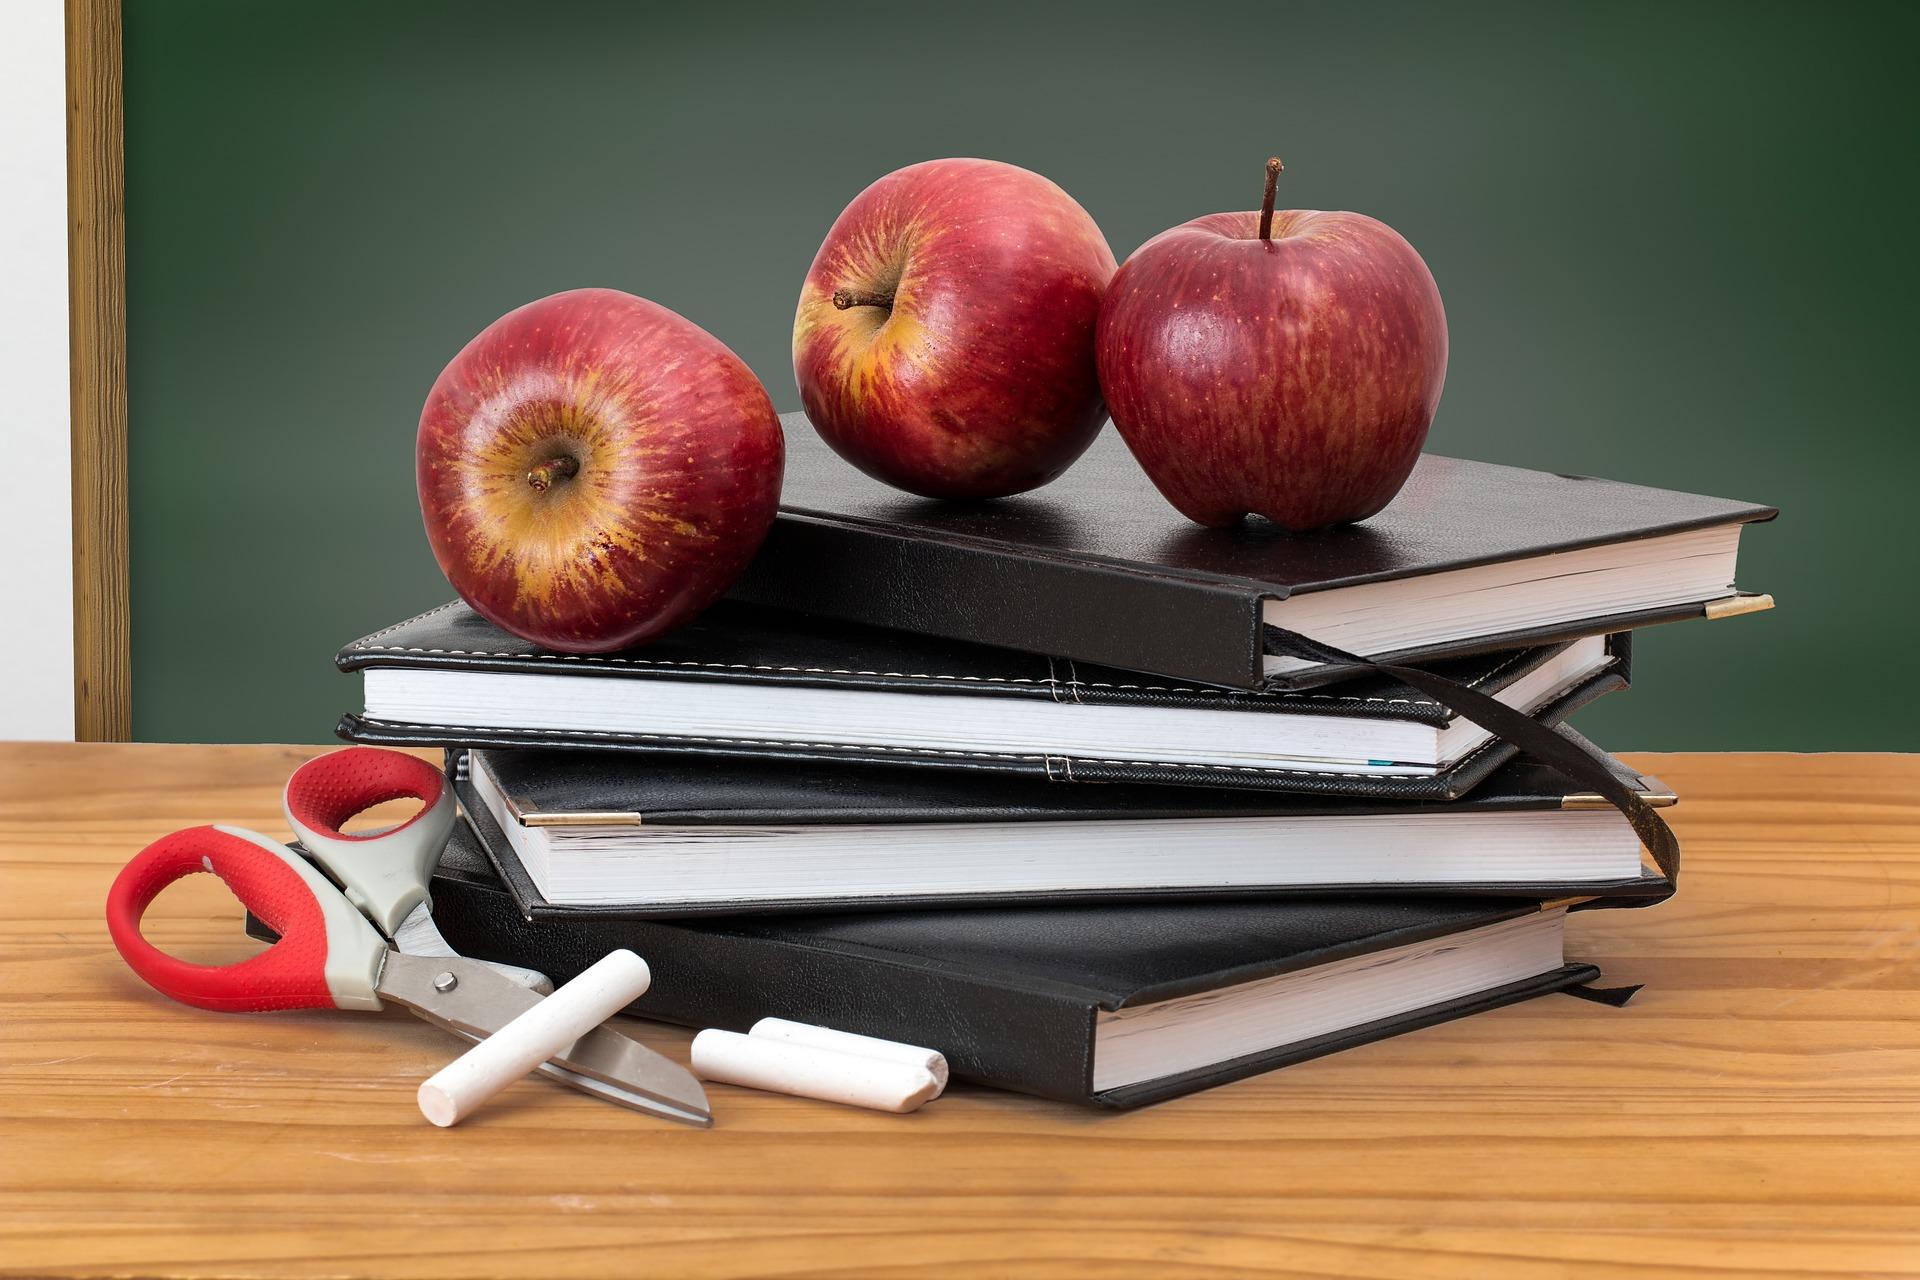 school-2276269_1920.jpg